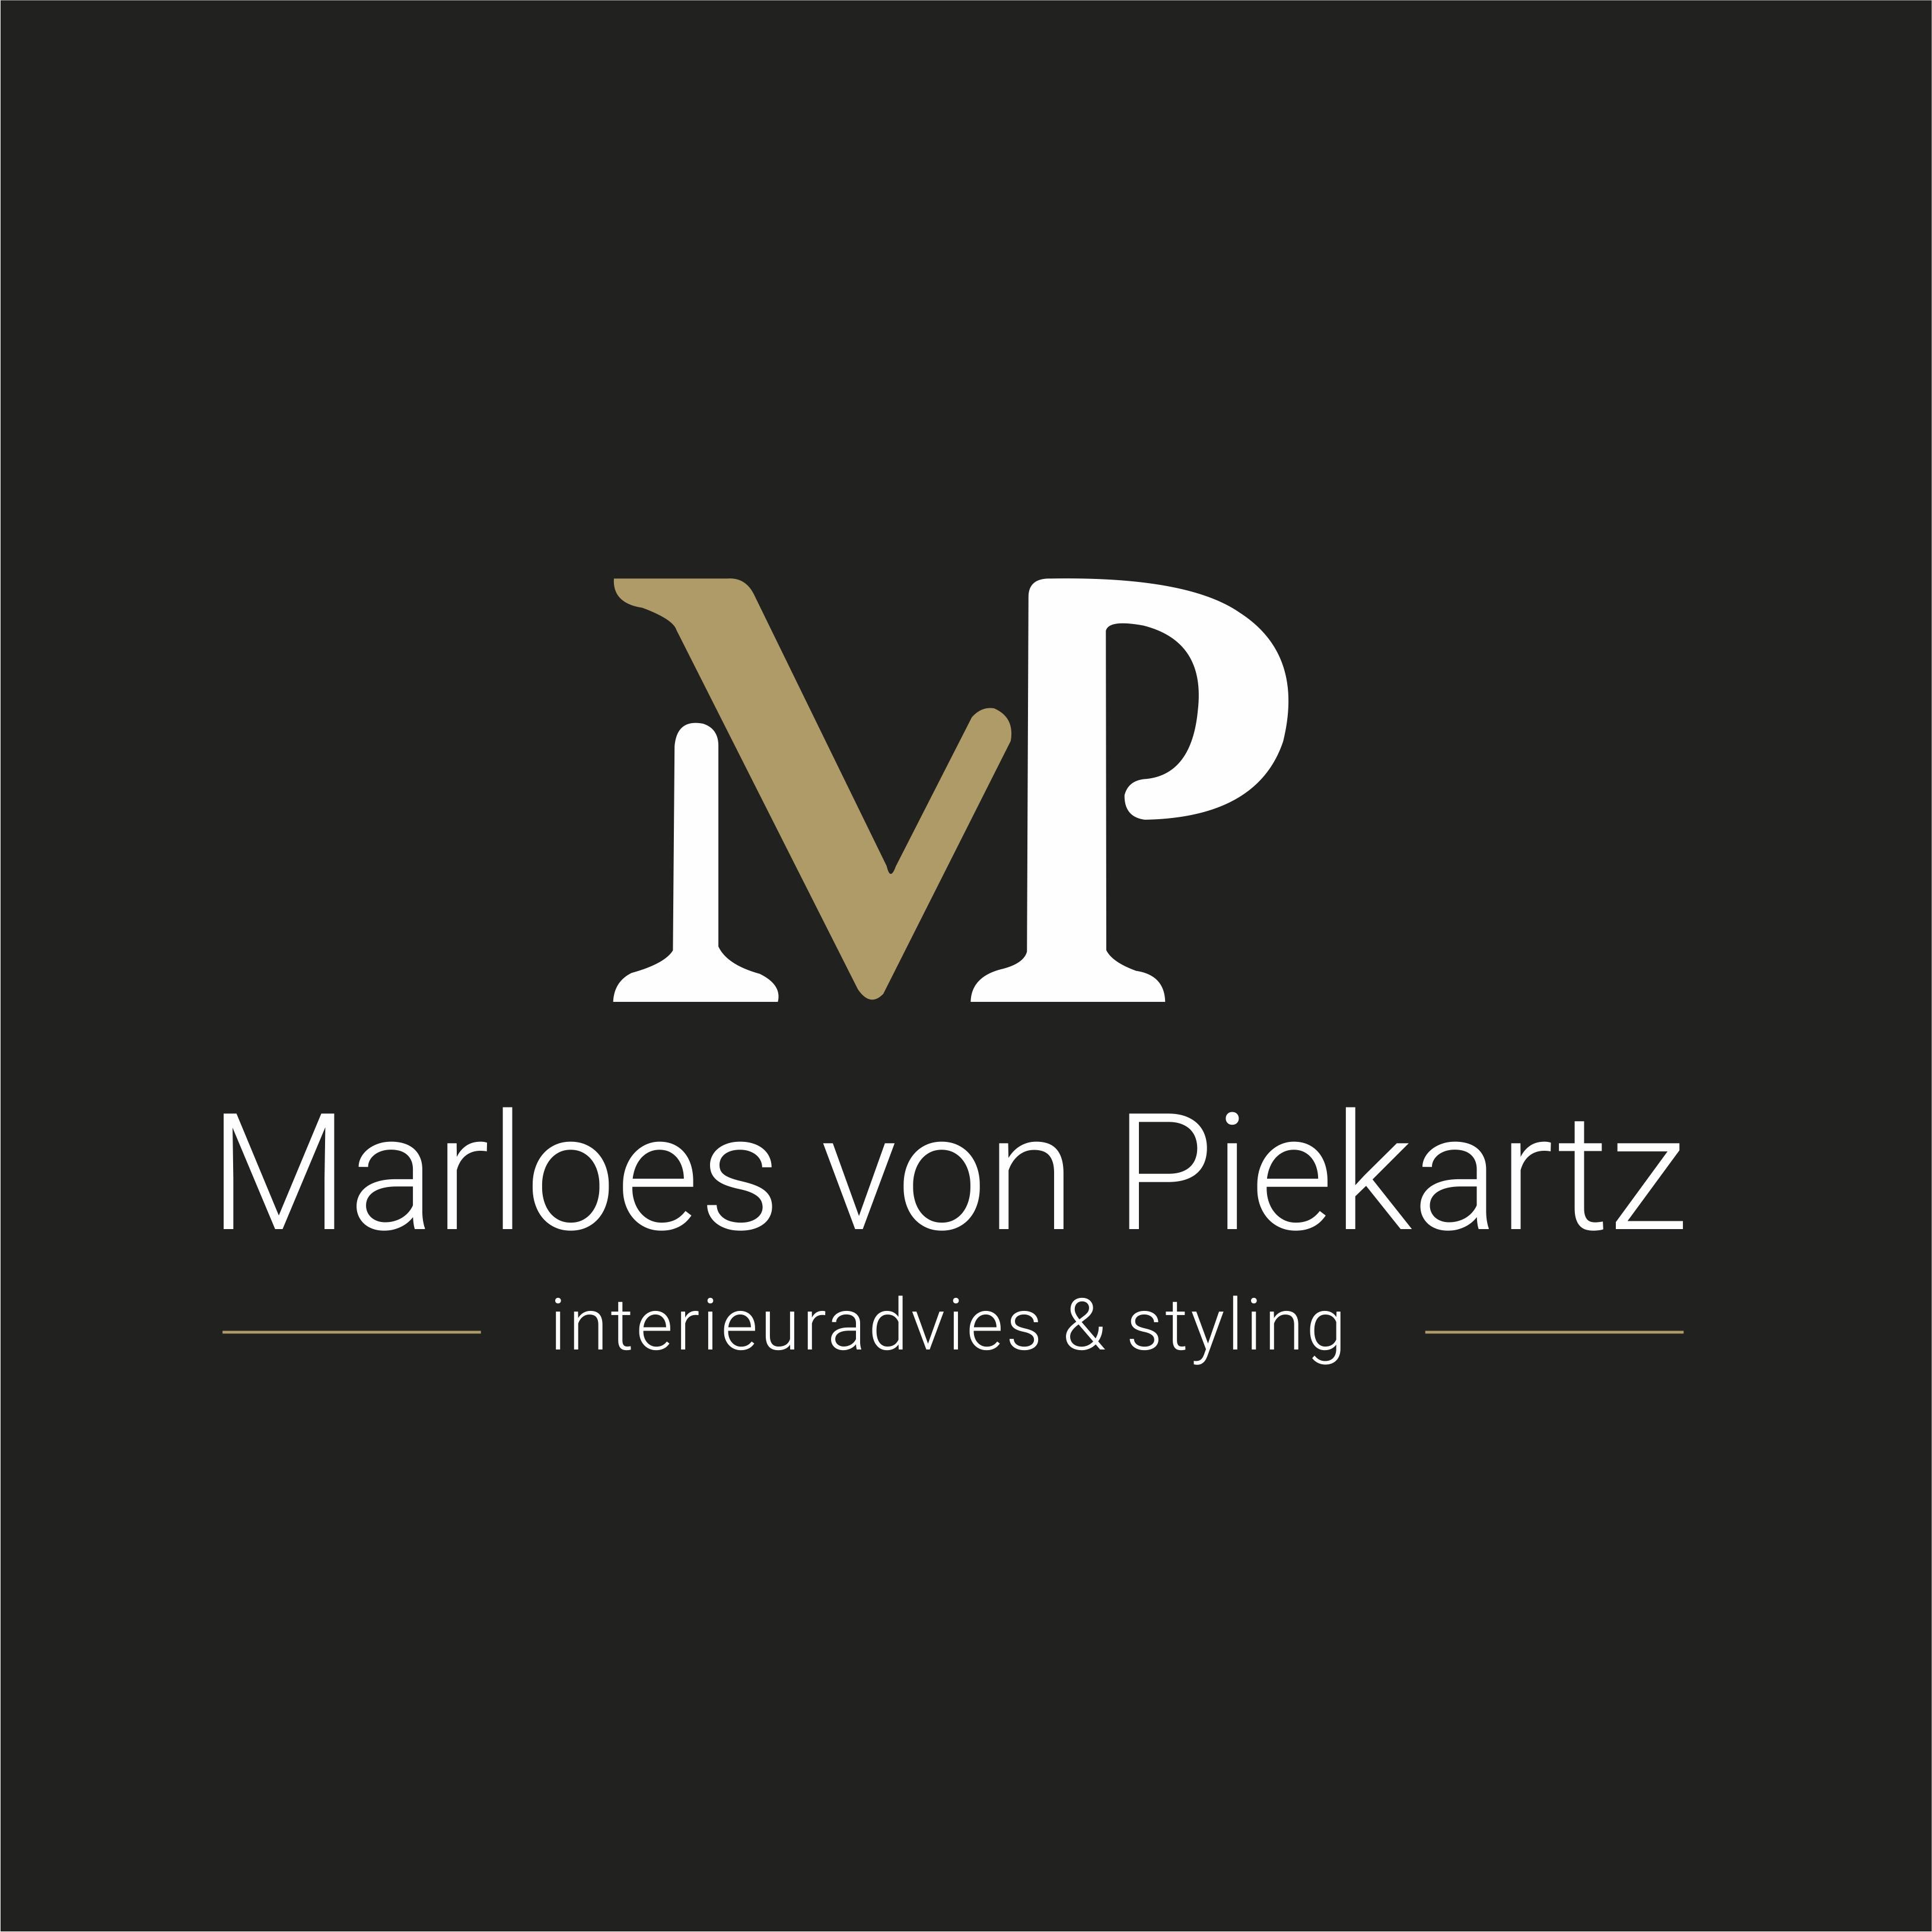 MVP interieuradvies & styling